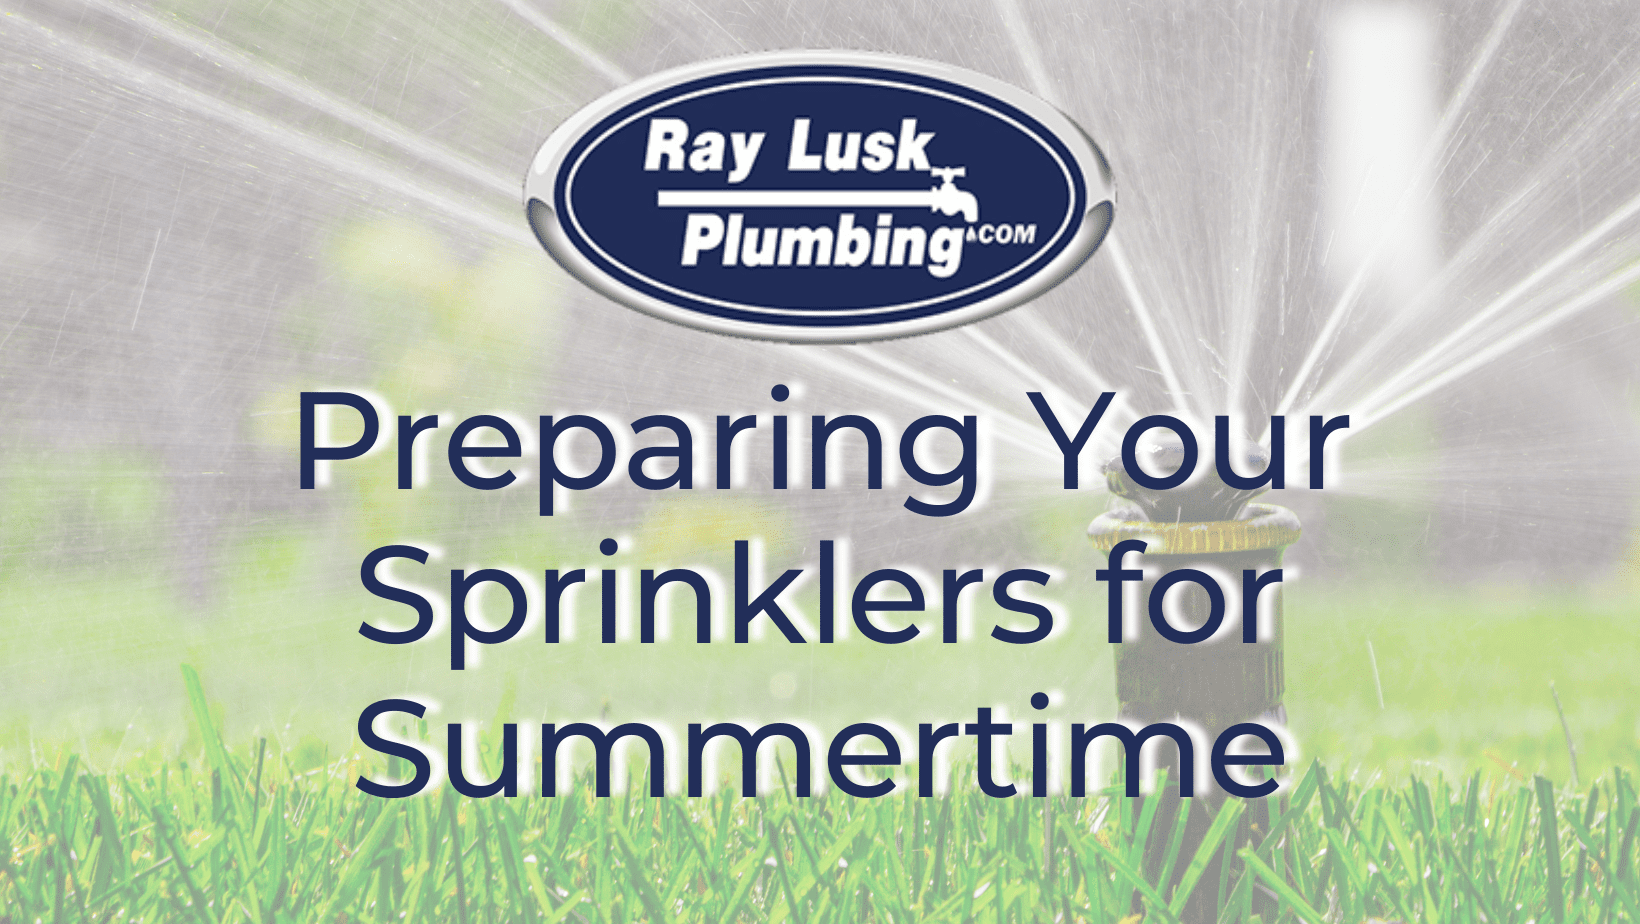 image text reads: sprinkler maintenance for summer